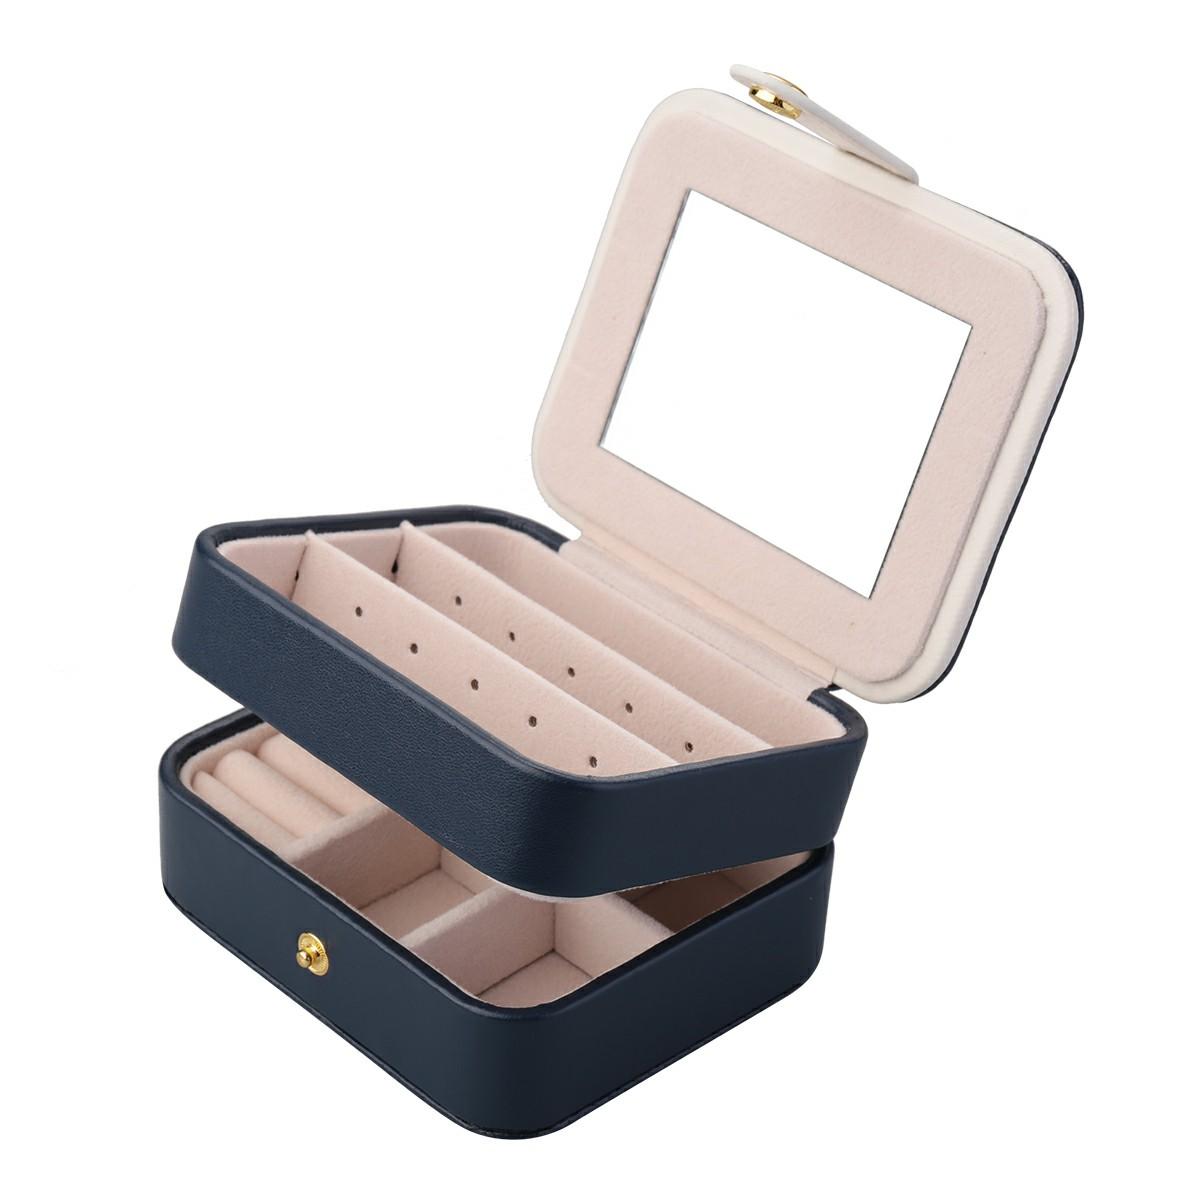 PU Small Jewelry Box Multilayer Travel Jewelry Box - Dark Blue